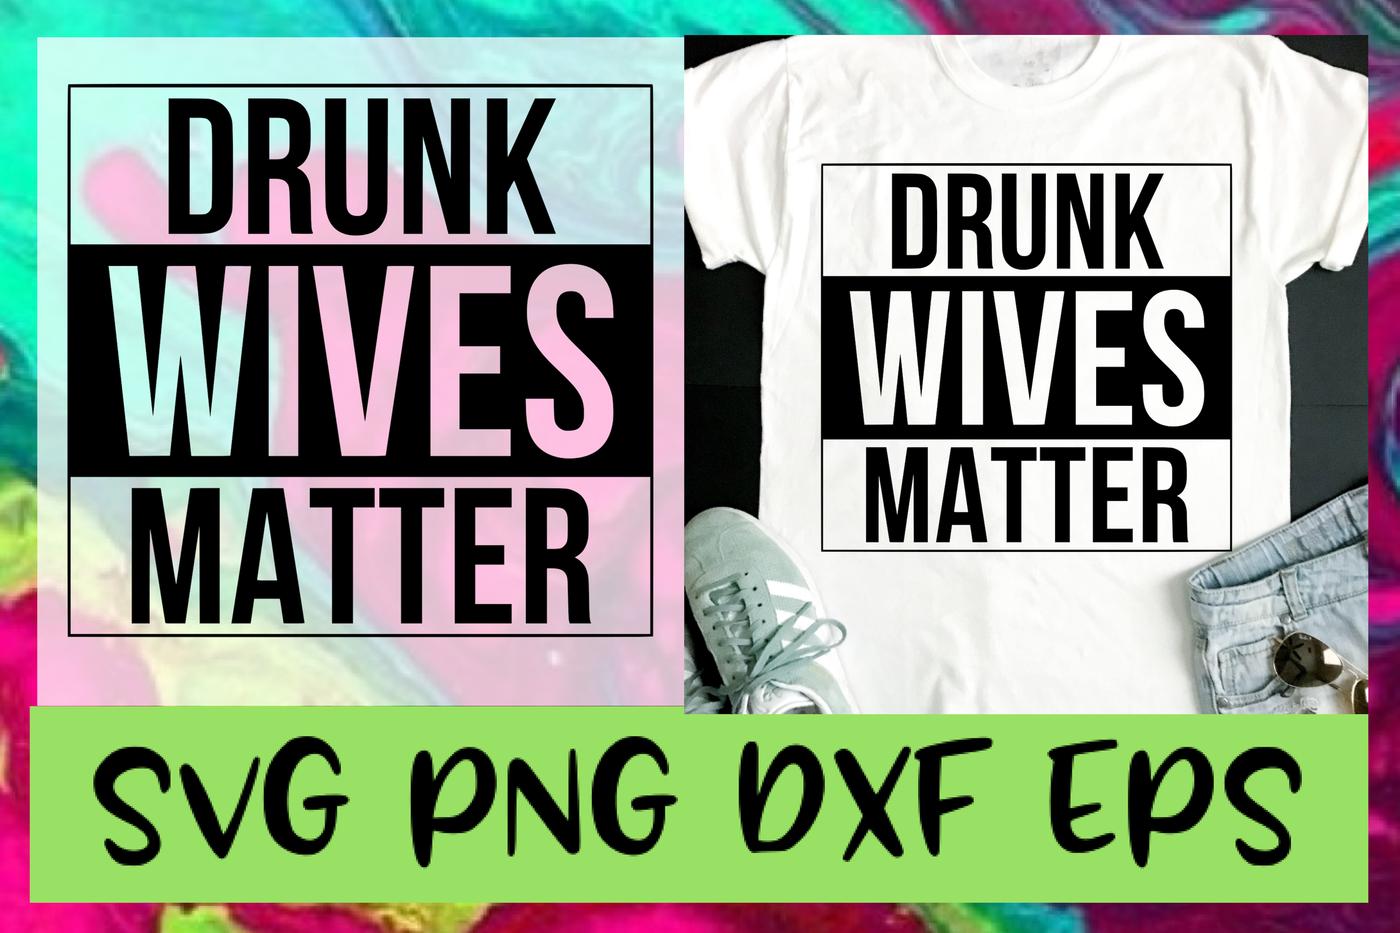 Drunk Wives Matter Svg Png Dxf Eps Design Files By Emsdigitems